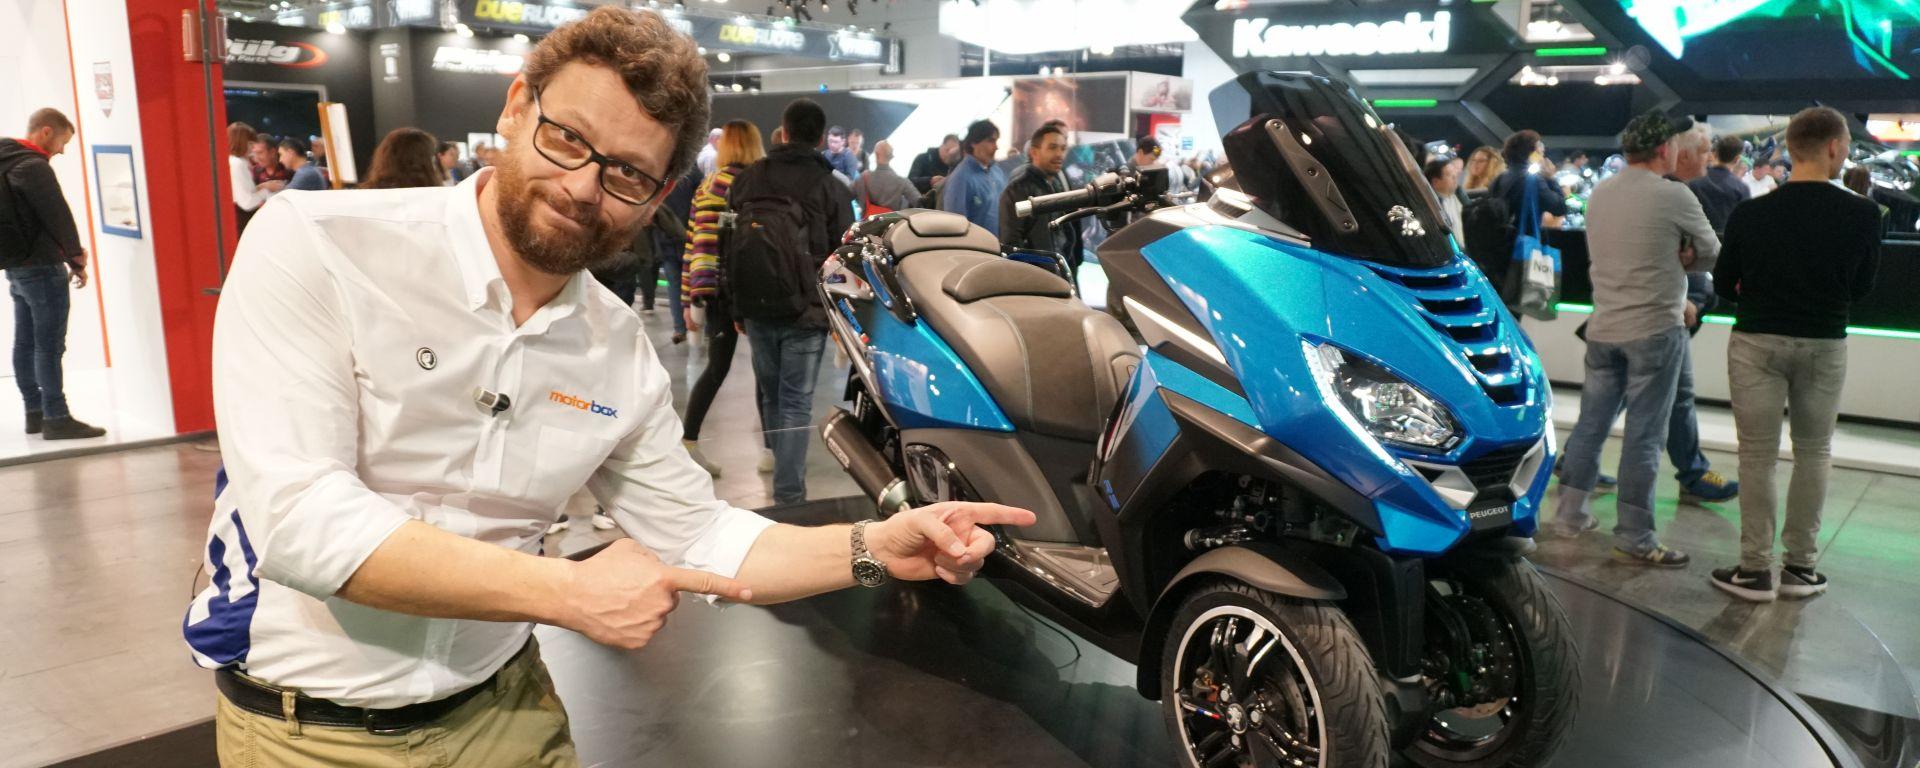 Peugeot Metropolis RS Concept: il video da Eicma 2019